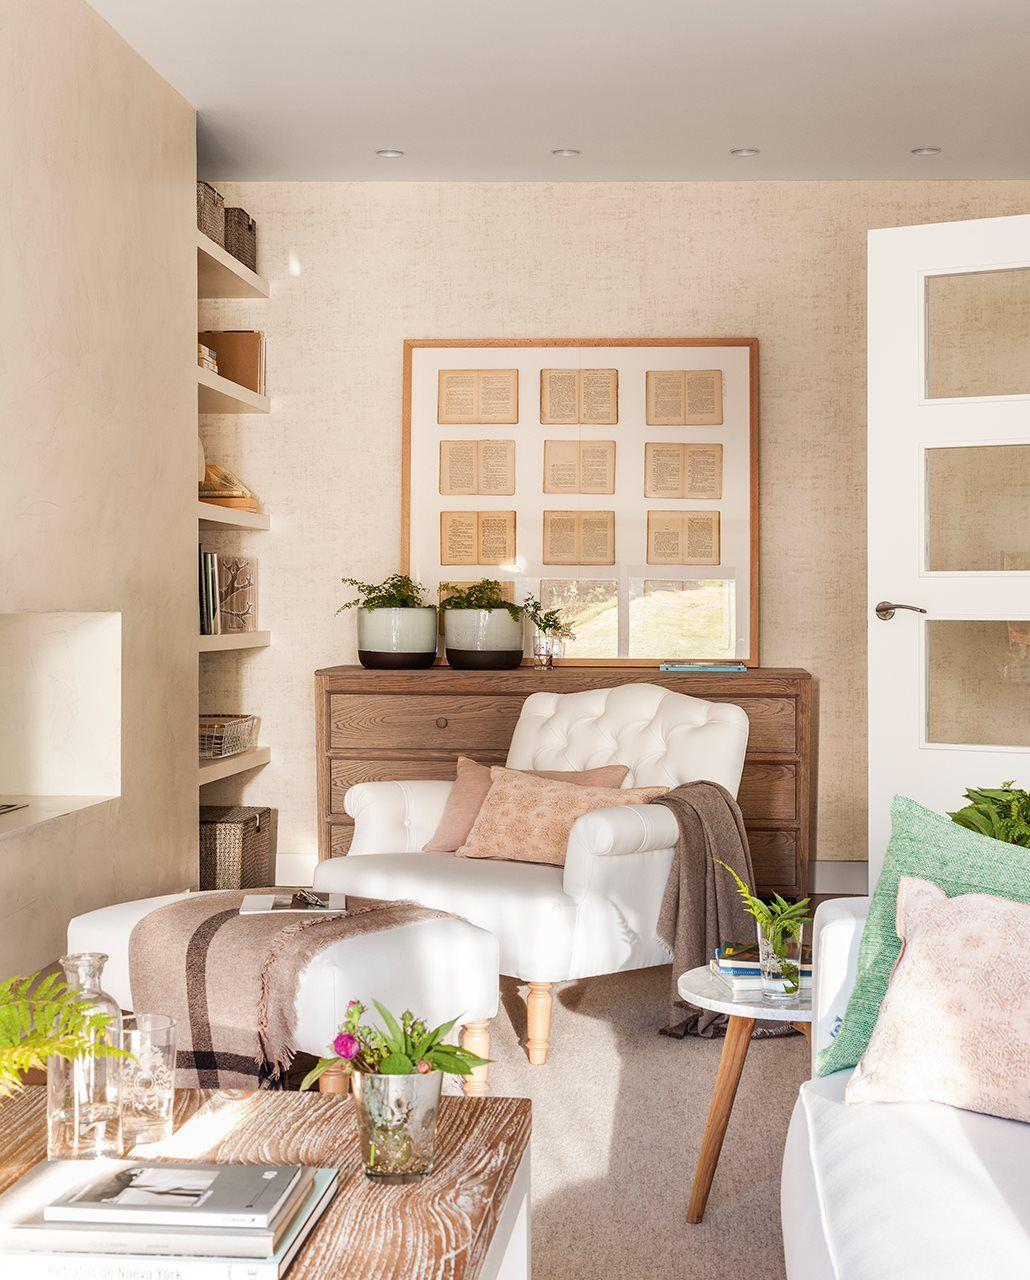 Pequeñas casas, grandes esperanzas | HOME | Pinterest | Casas ...